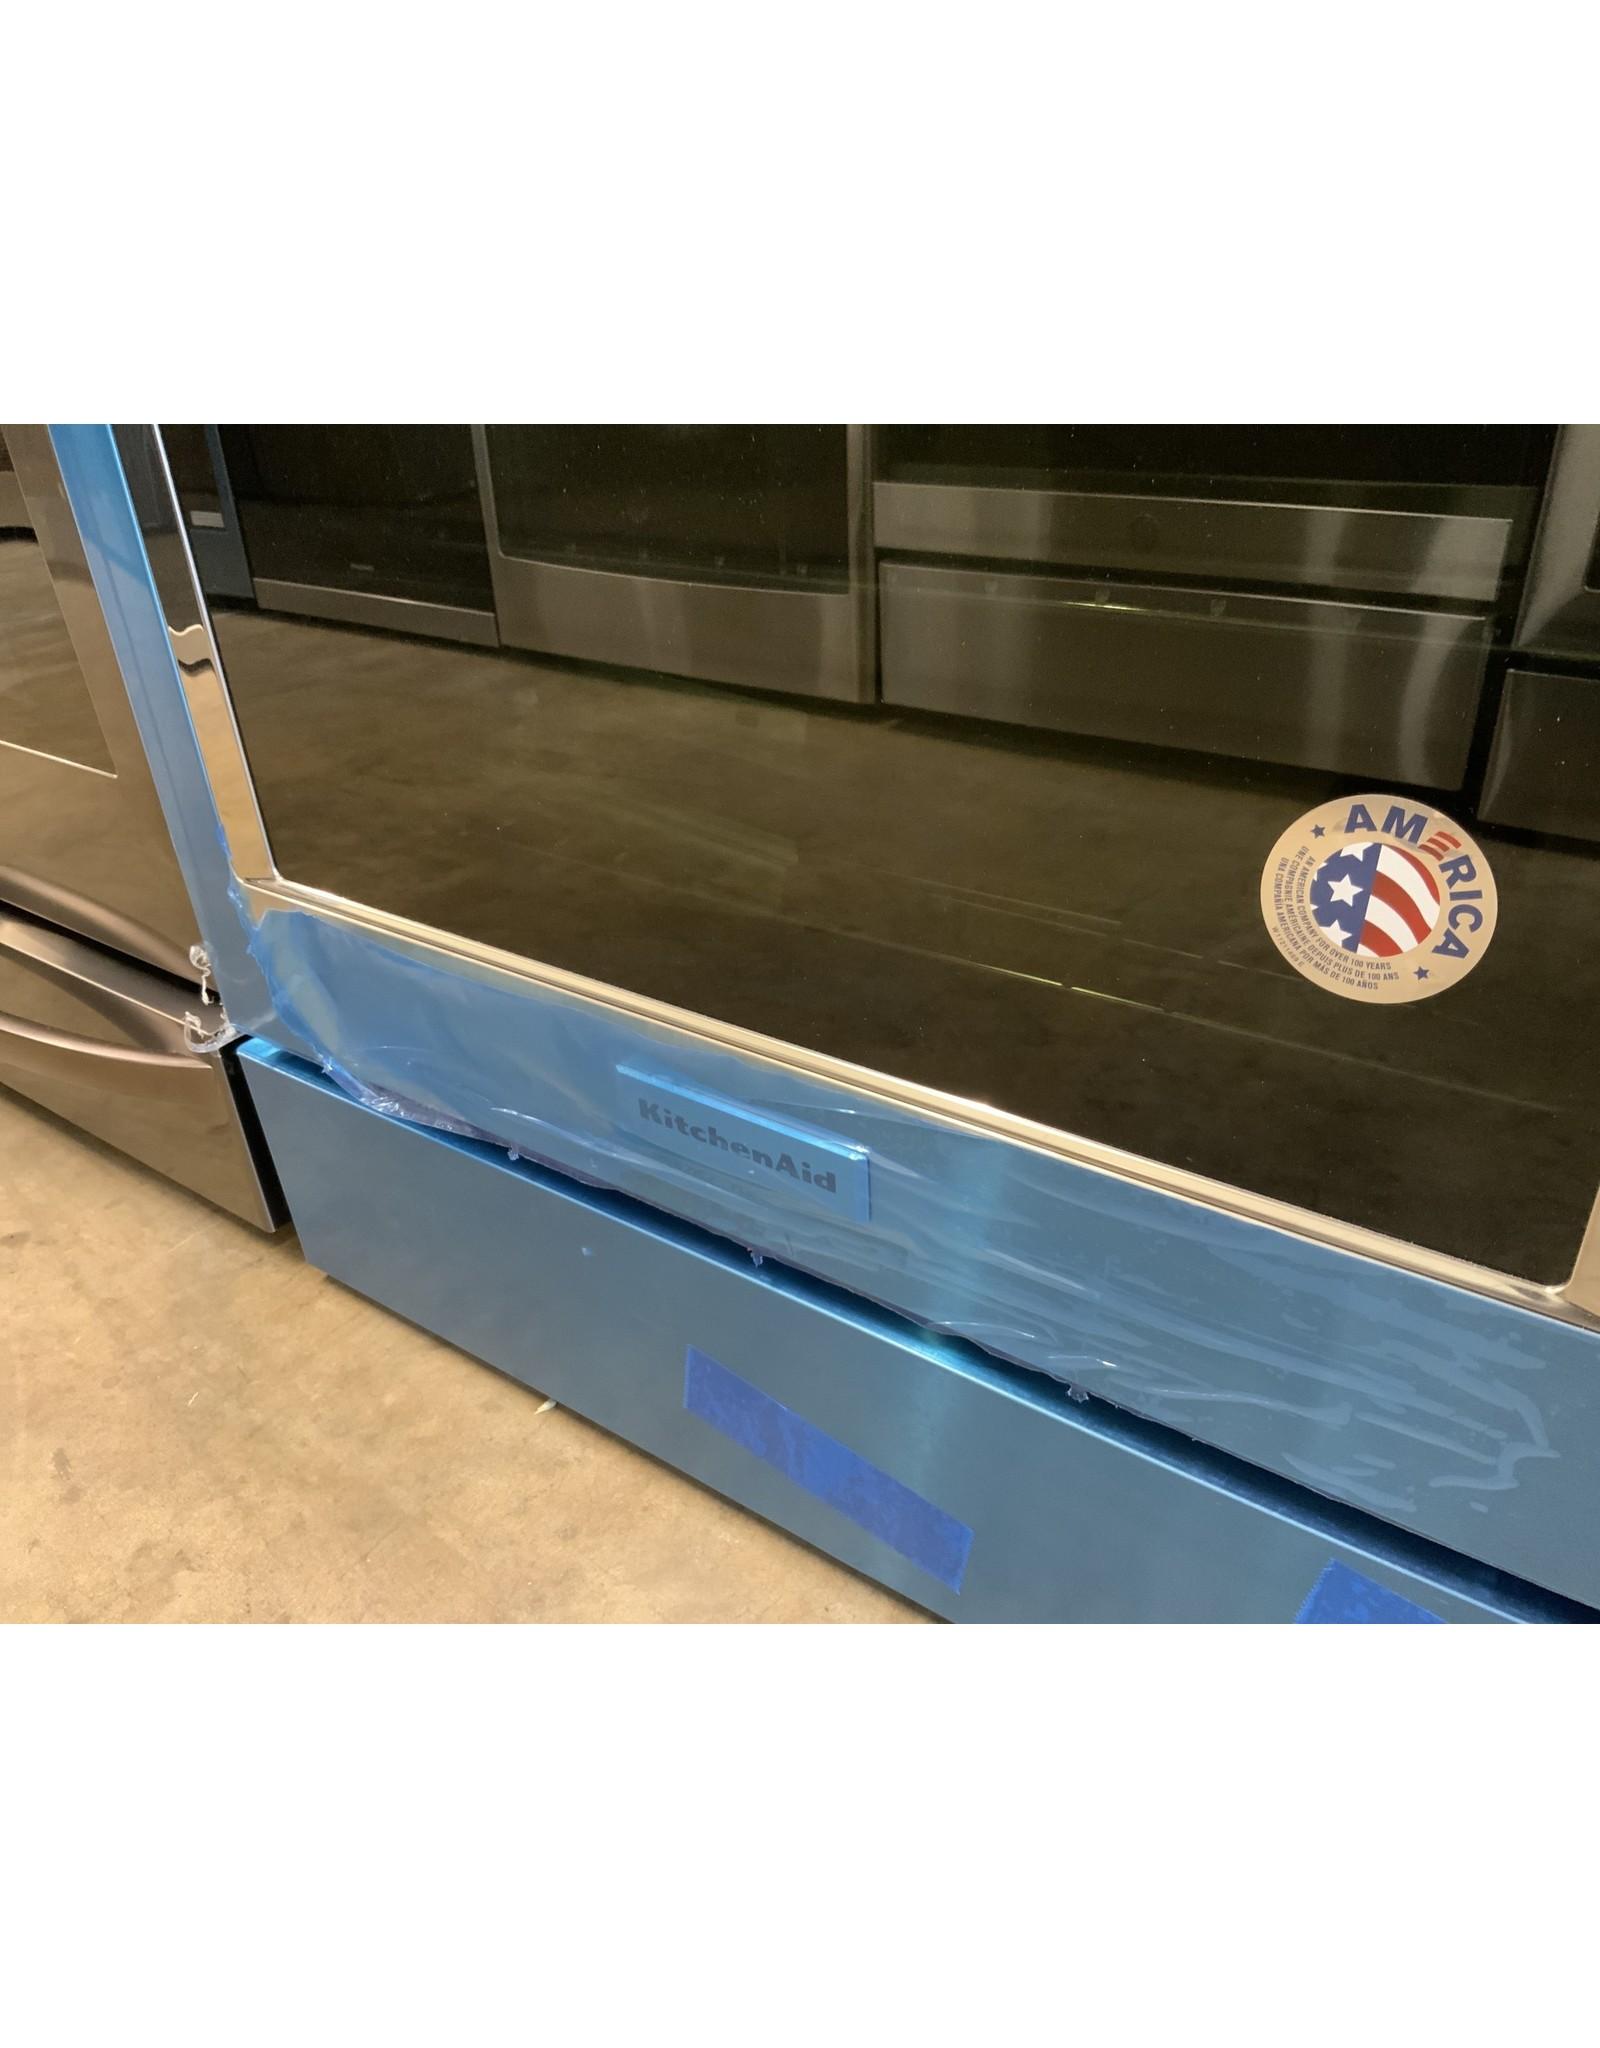 Kitchenaid KSDG950ESS 30IN 4BRNR 2FUEL DNDRFT Range